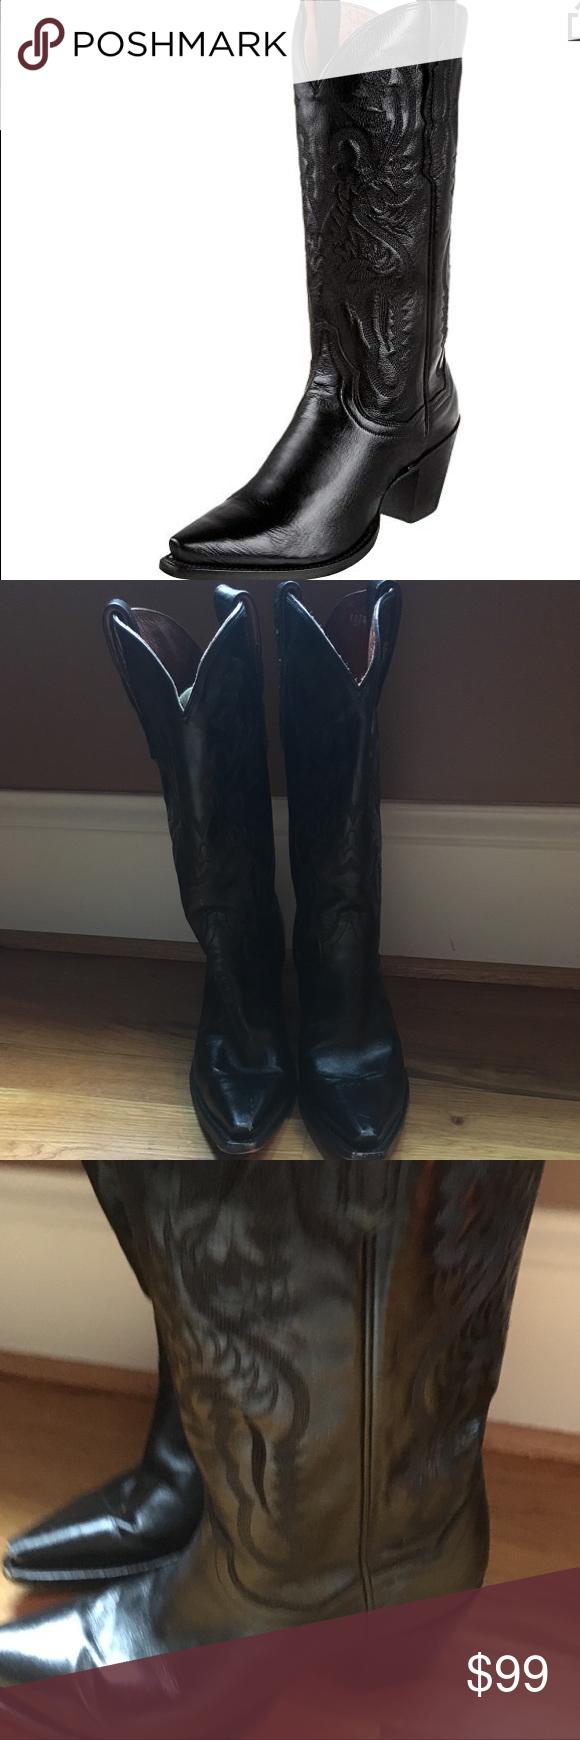 3ebce73c70e Dan Post Women's Maria black leather western boot Infuse your urbane ...